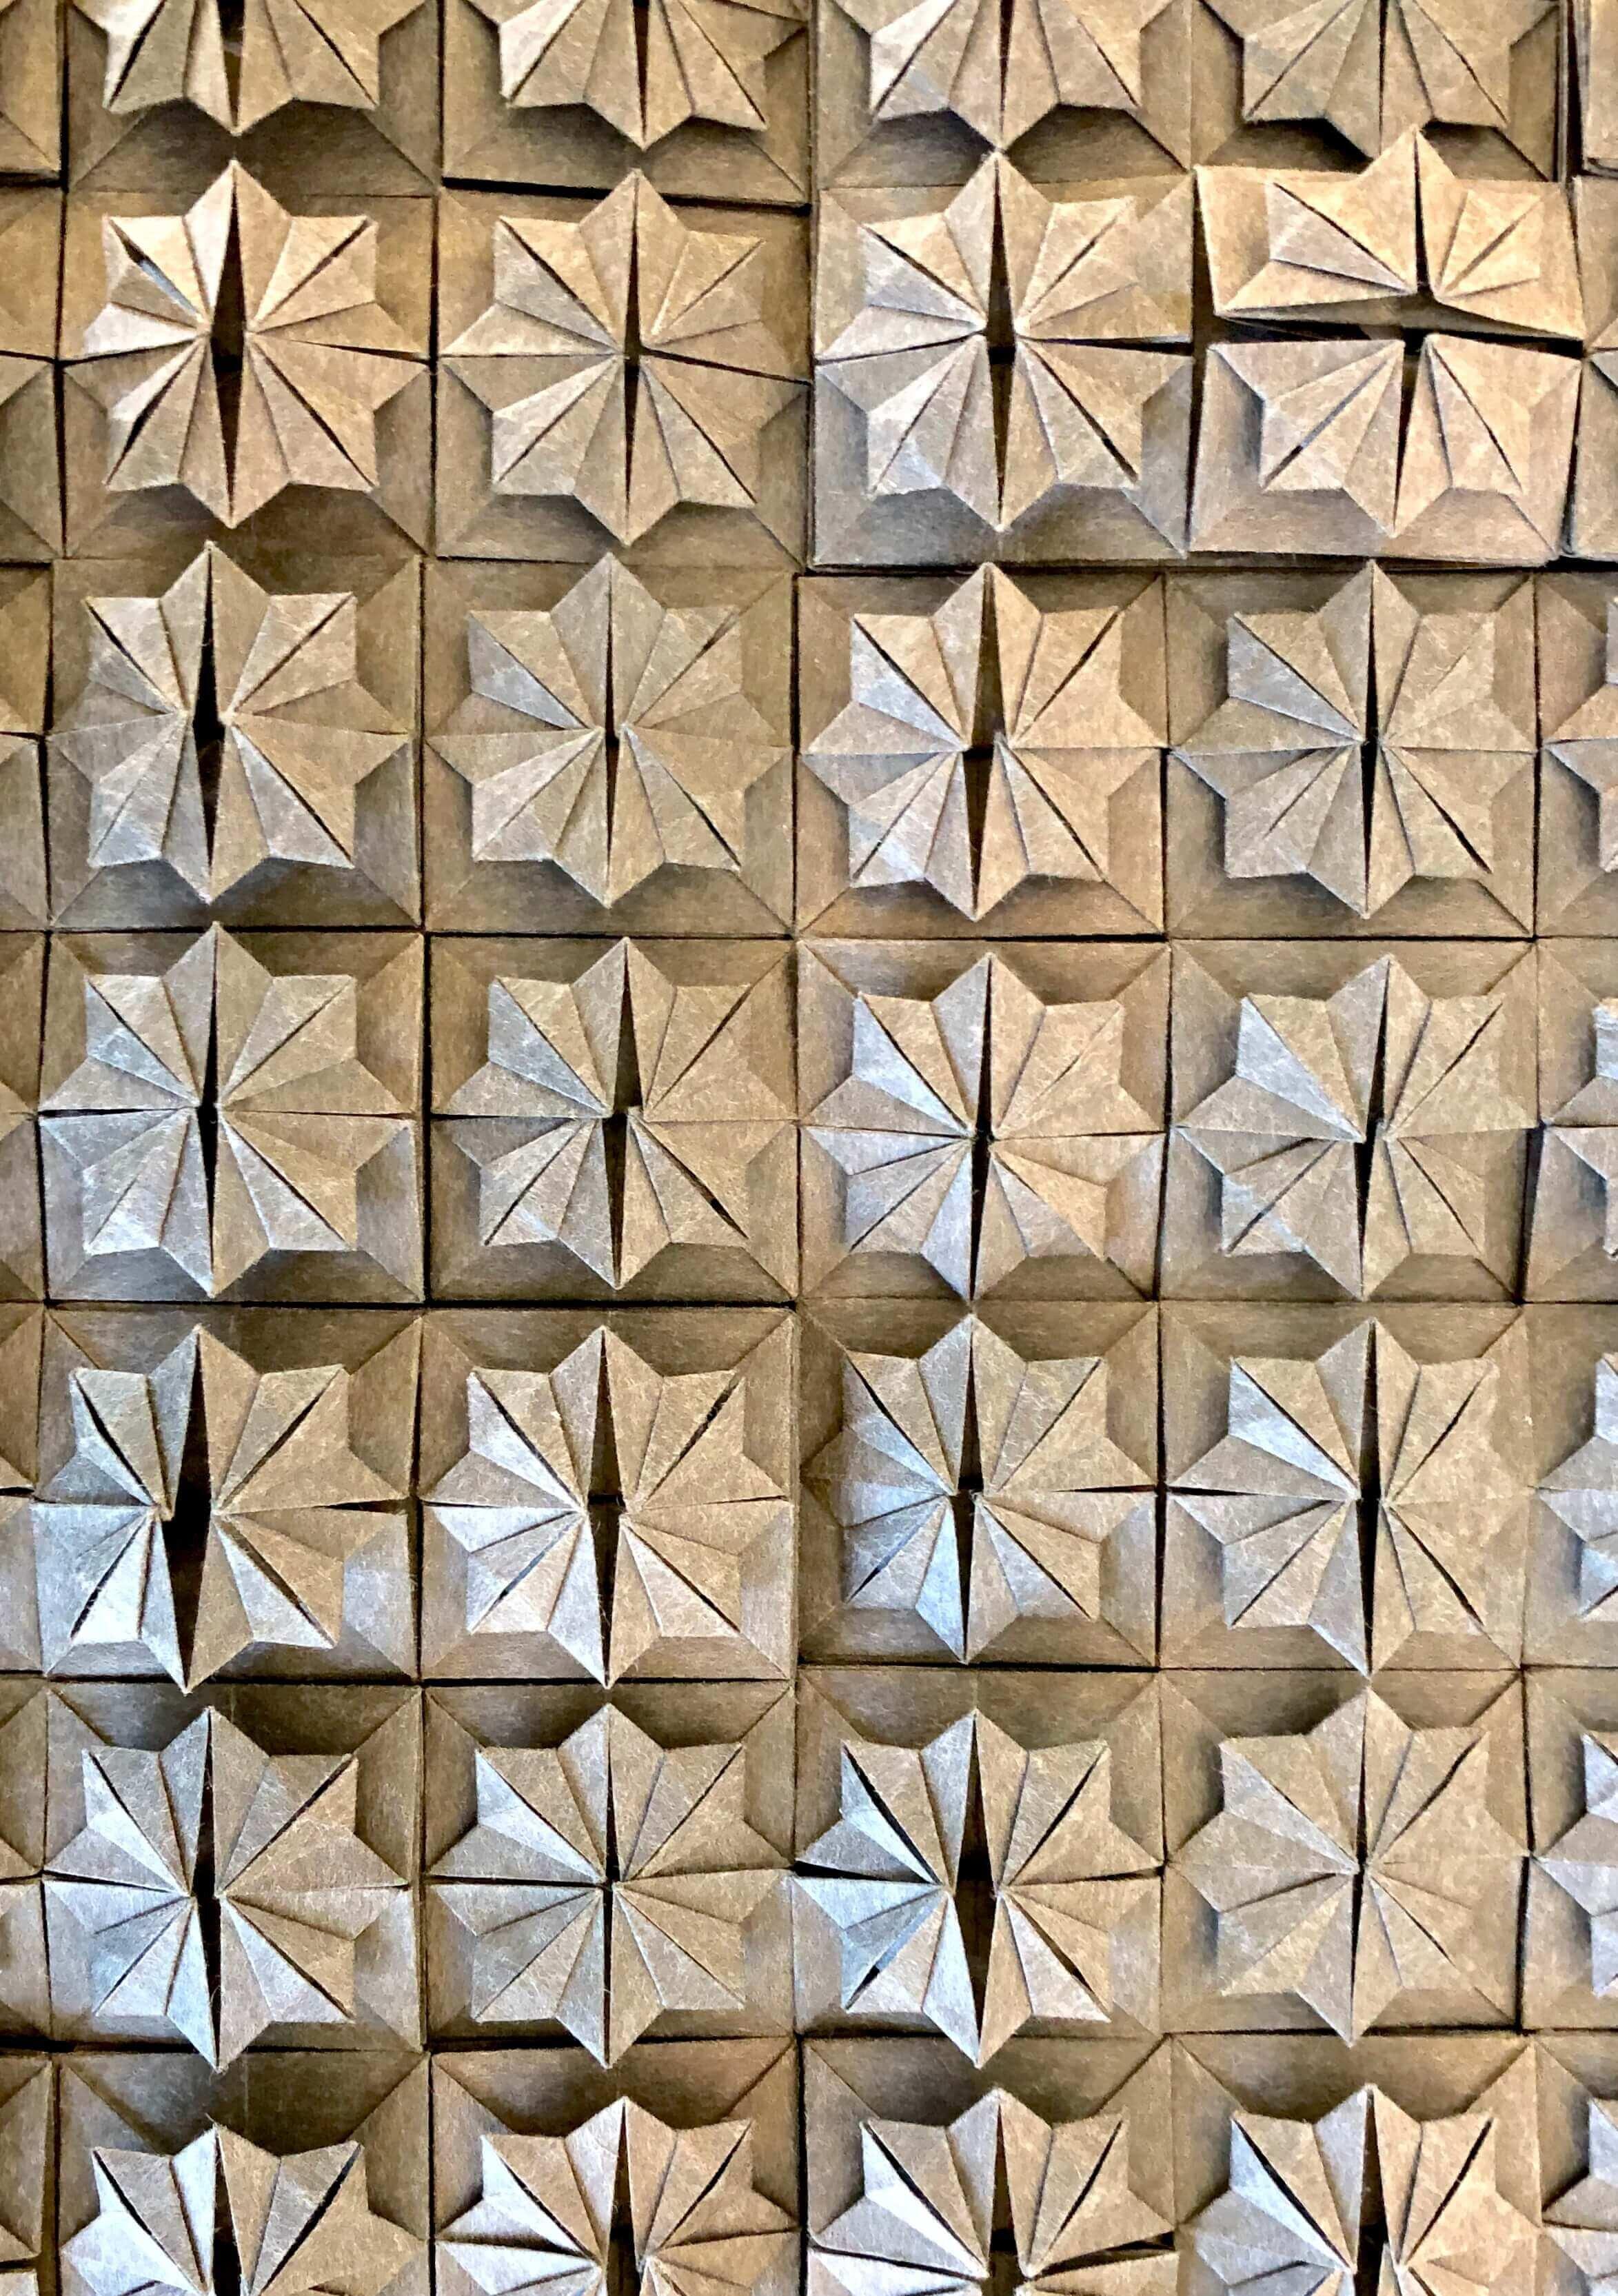 Linda-Allard-Forsman--Tomas-Robefelt--papper--sadelmakarlangan--2019--7.jpg